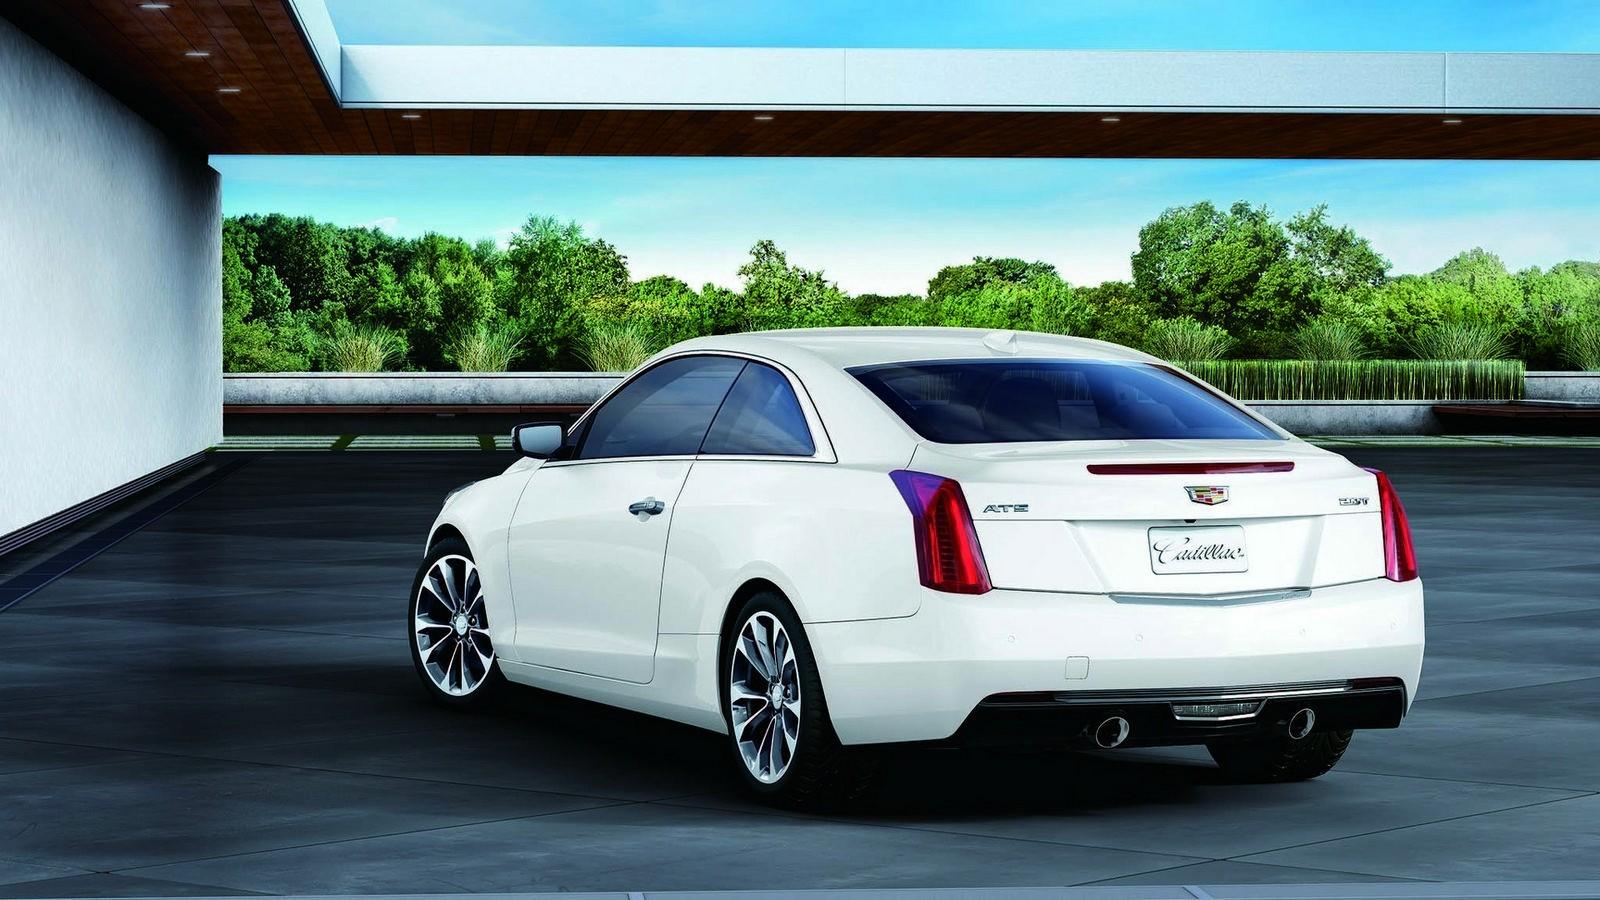 Cadillac ATS / ATS Coupe / CTS White Edition